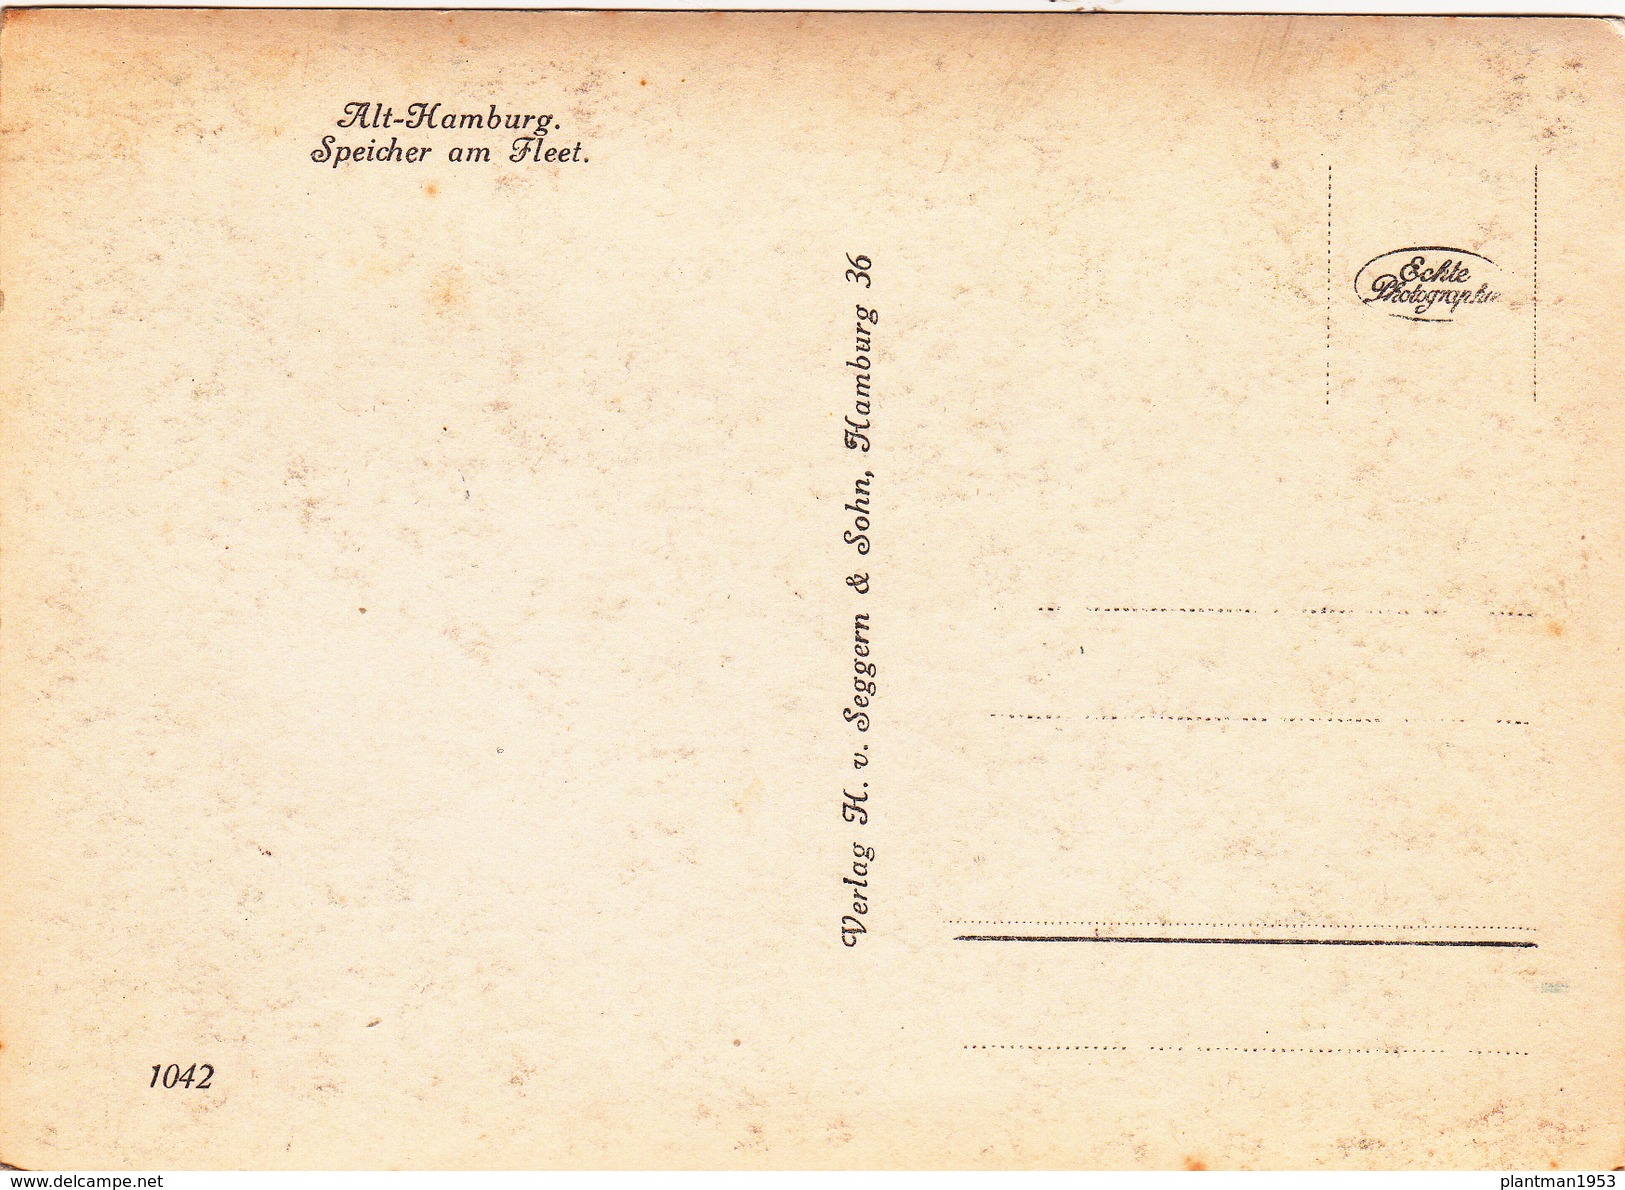 Reproduction?,Modern Post Card Of Alt-Hamburg, Hamburg, Germany,D16. - Germany